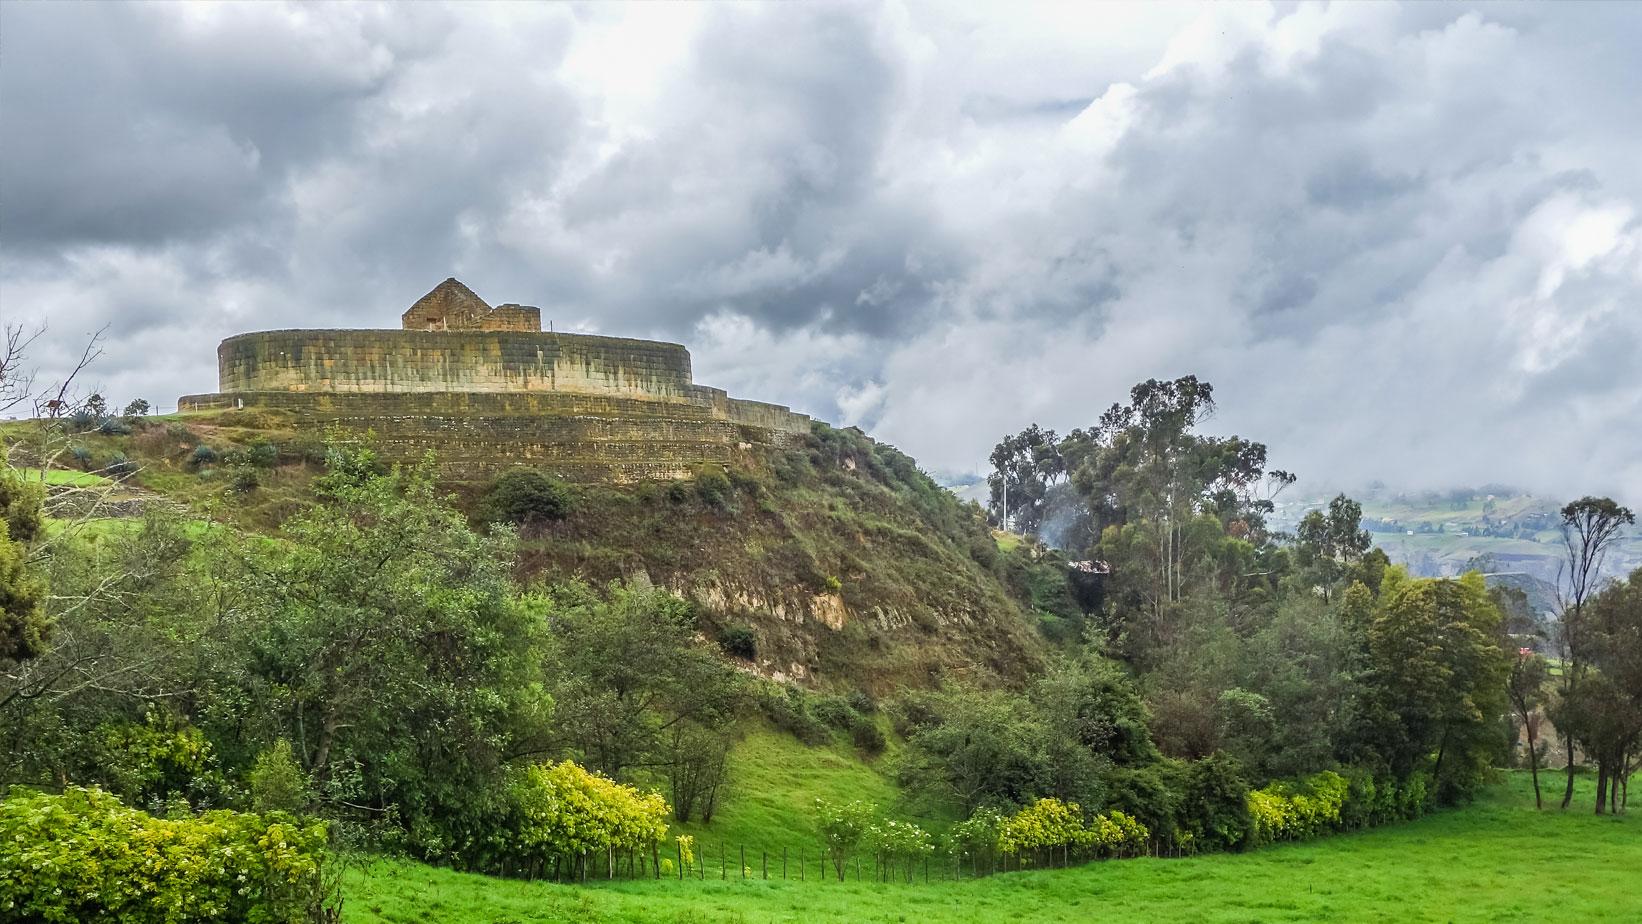 Temple of the Sun, Ingapirca